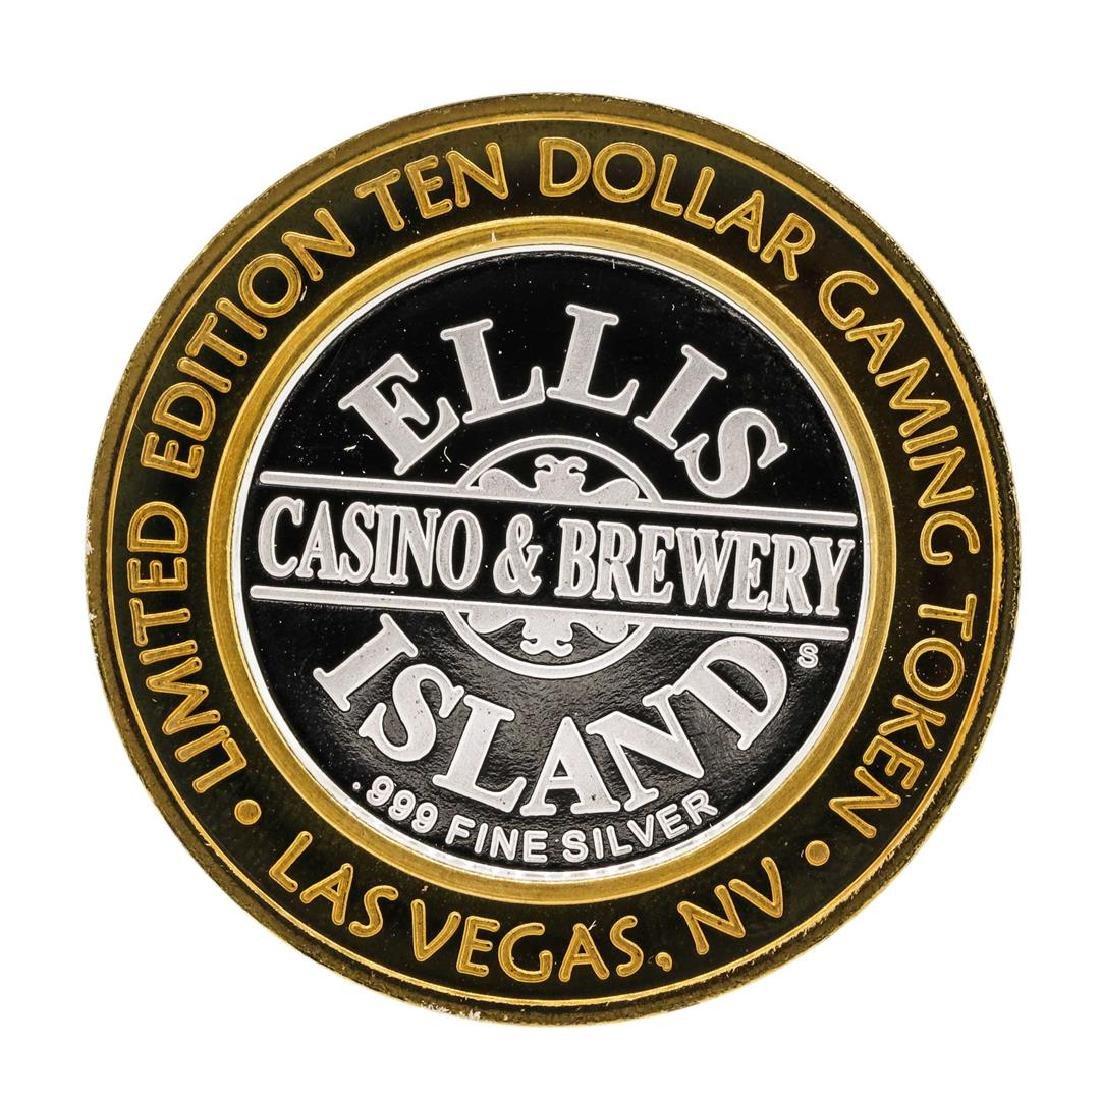 .999 Silver Ellis Island Casino & Brewery Las Vegas $10 - 2